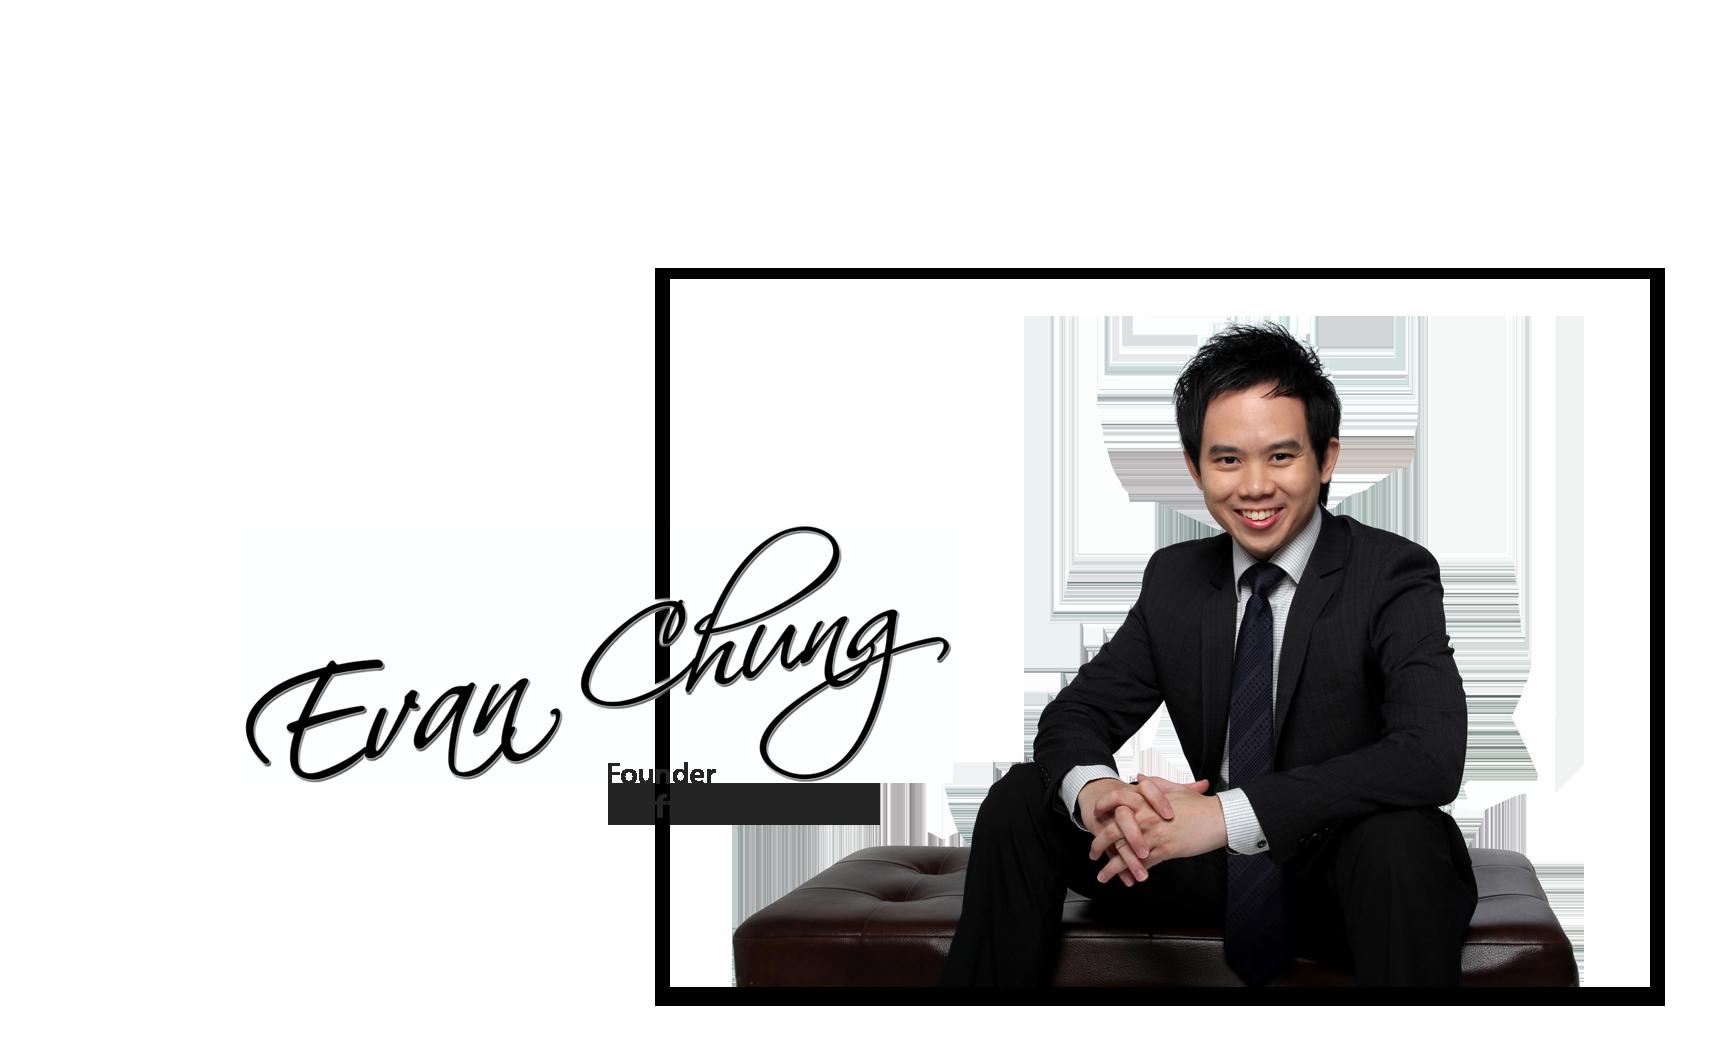 Affluence Group - Evan Chung